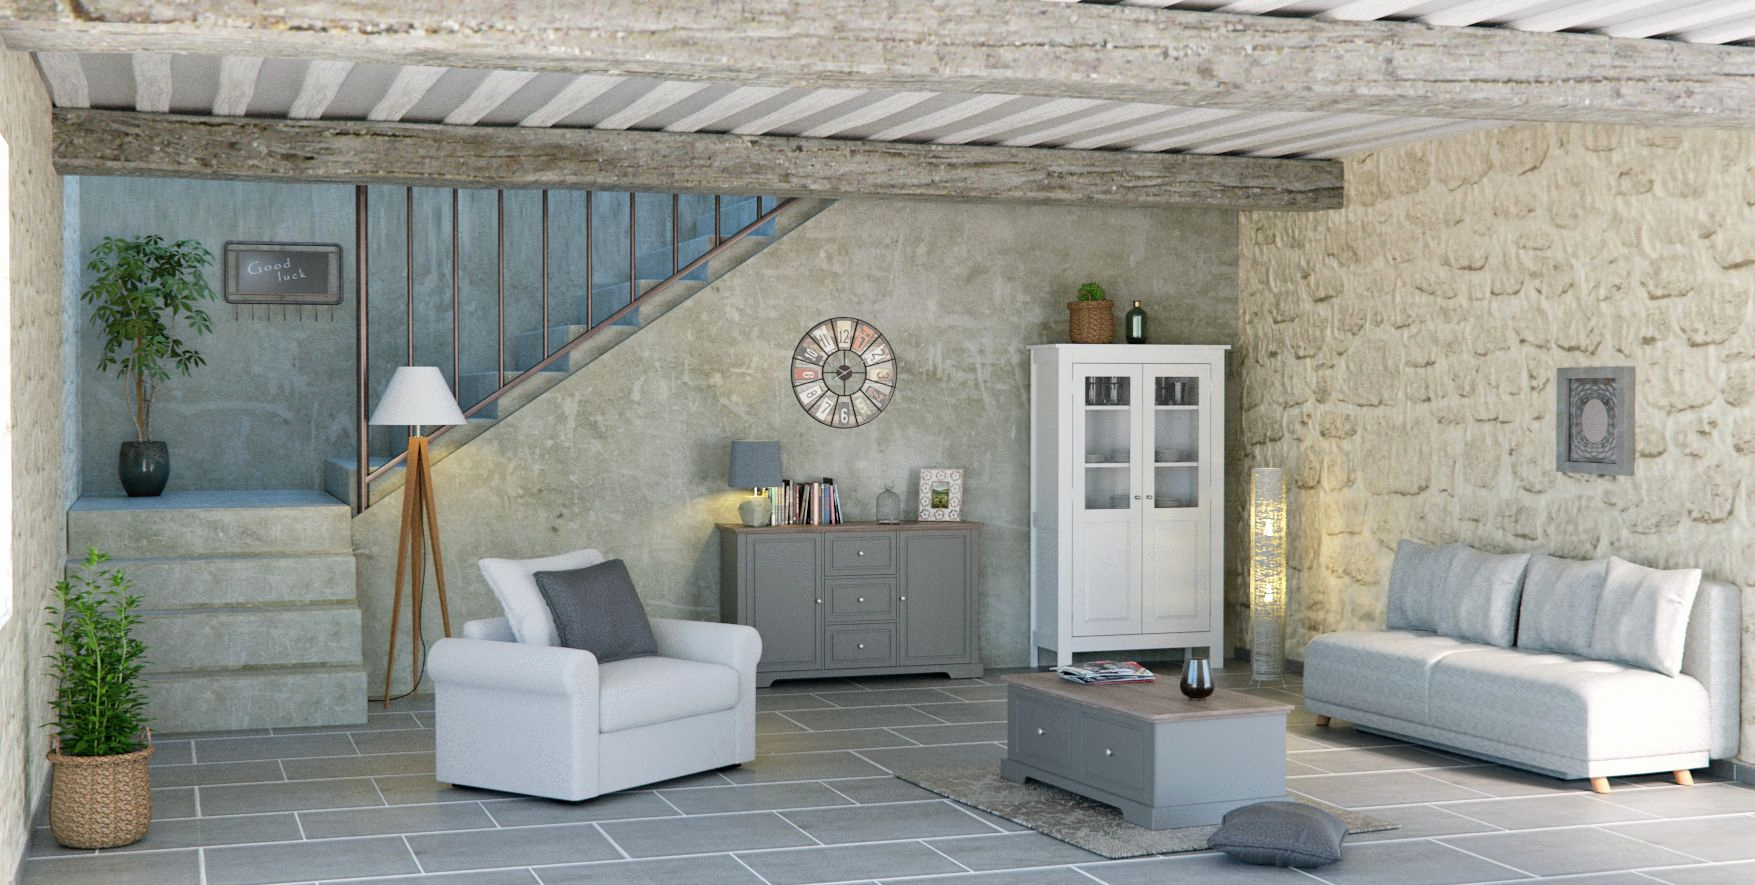 Cuir Center Plan De Campagne Impressionnant Stock Cuir Design Plan De Campagne Luxe Salon Cosy Classique Mur De Pierre